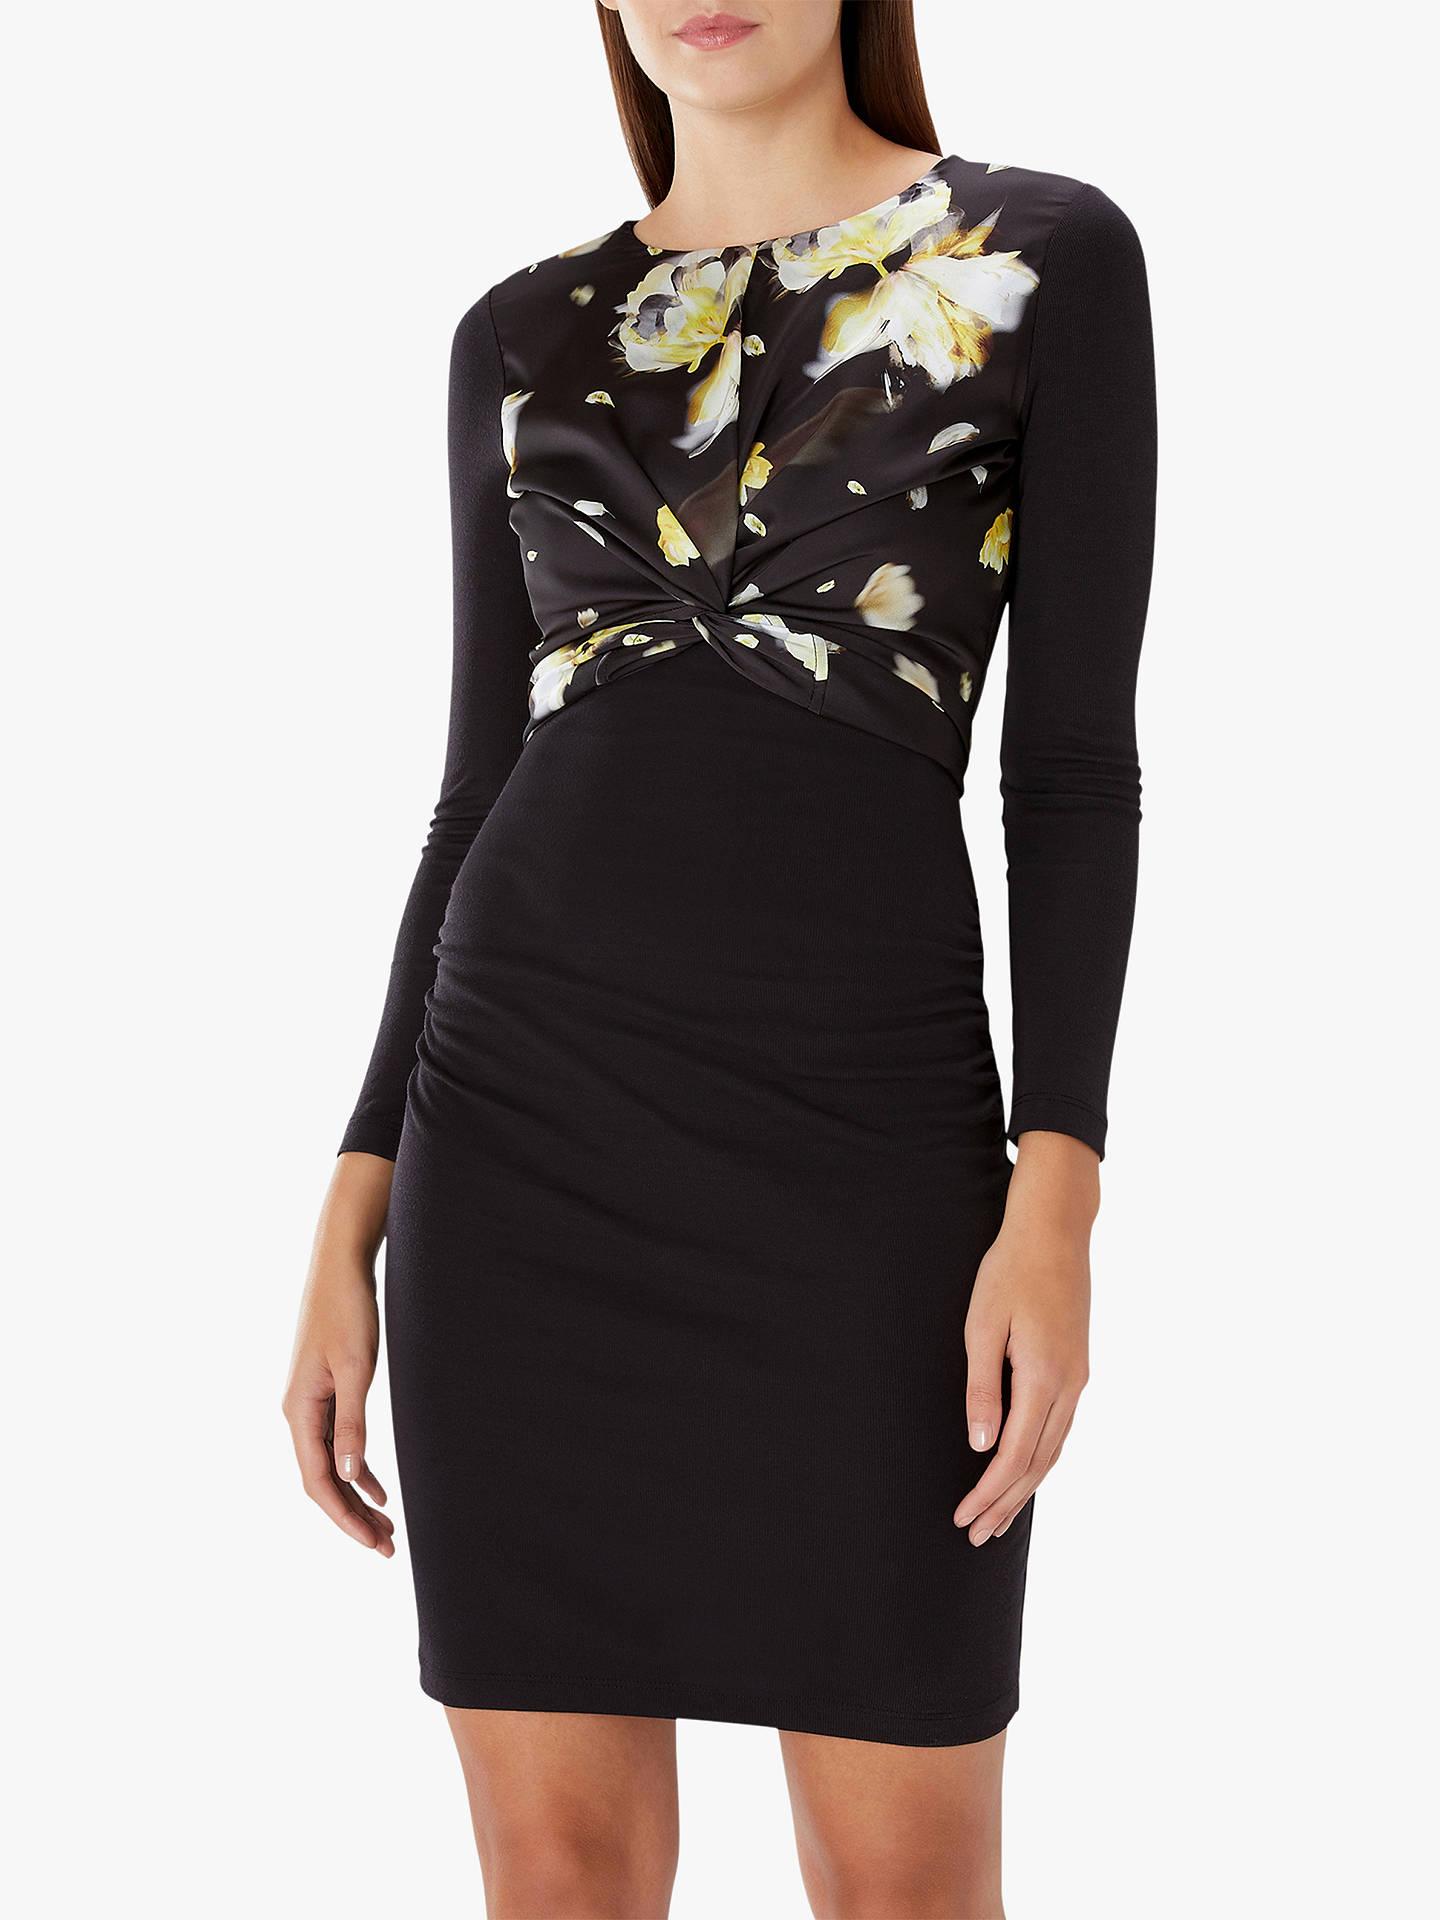 69c2e172fc0 Buy Coast Melody Print Jersey Dress